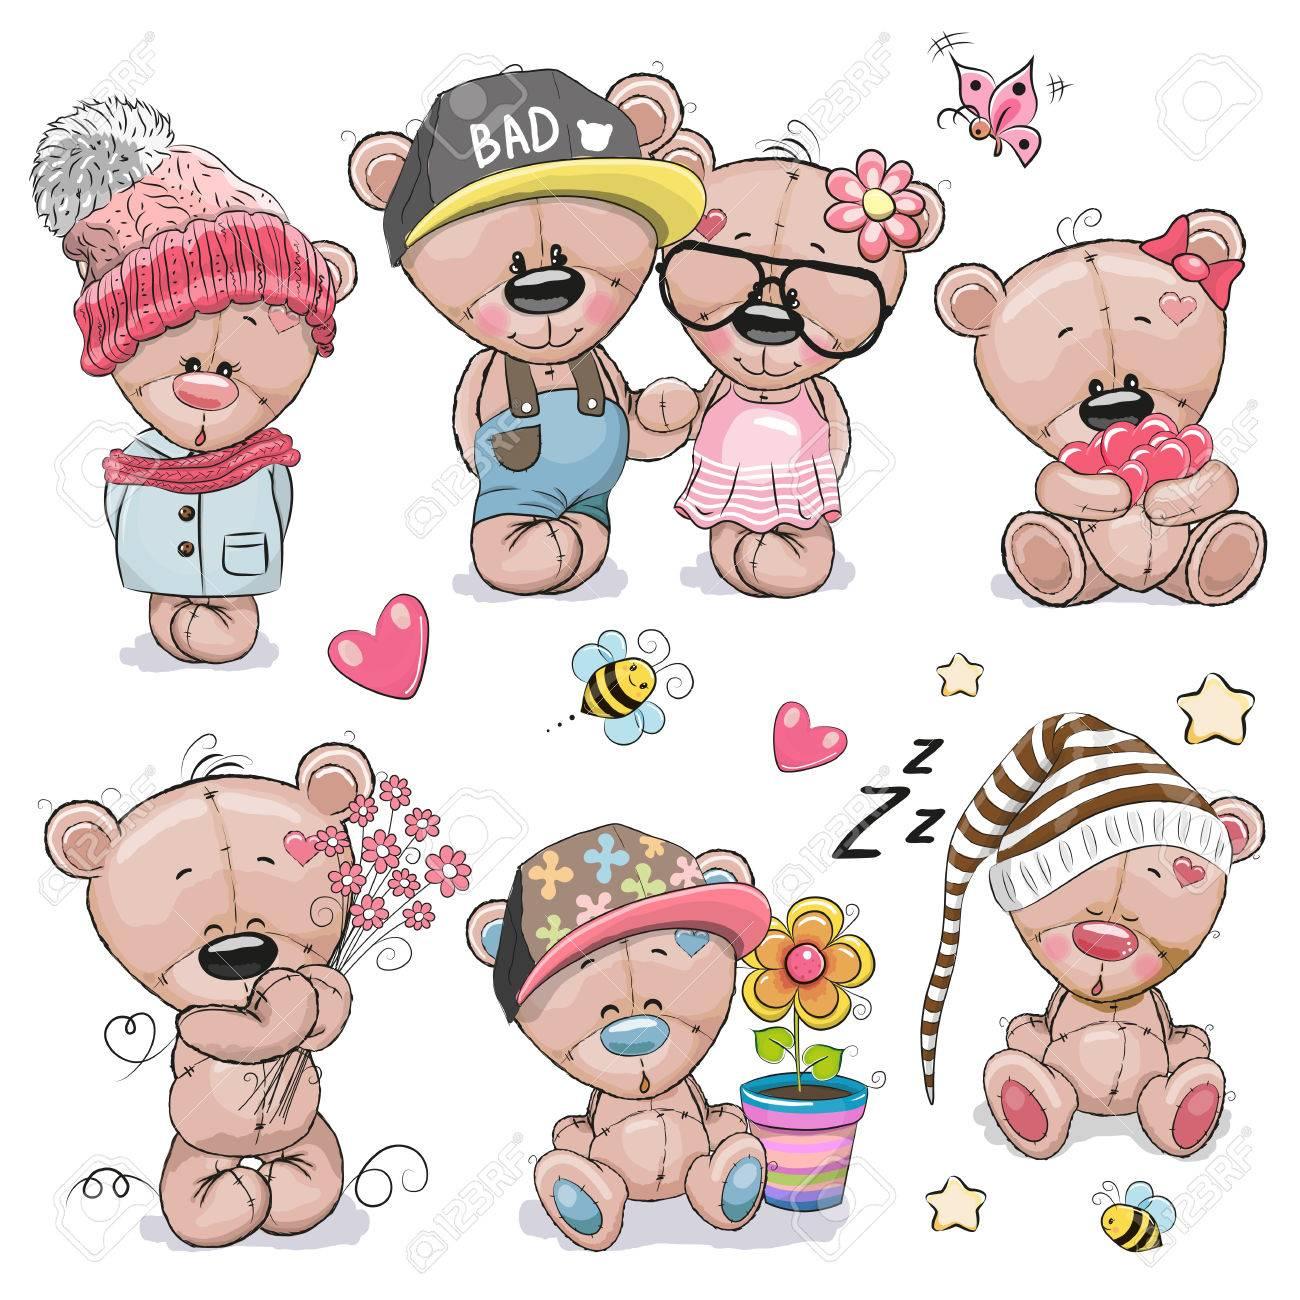 Set of Cute Cartoon Teddy Bear on a white background - 77395755